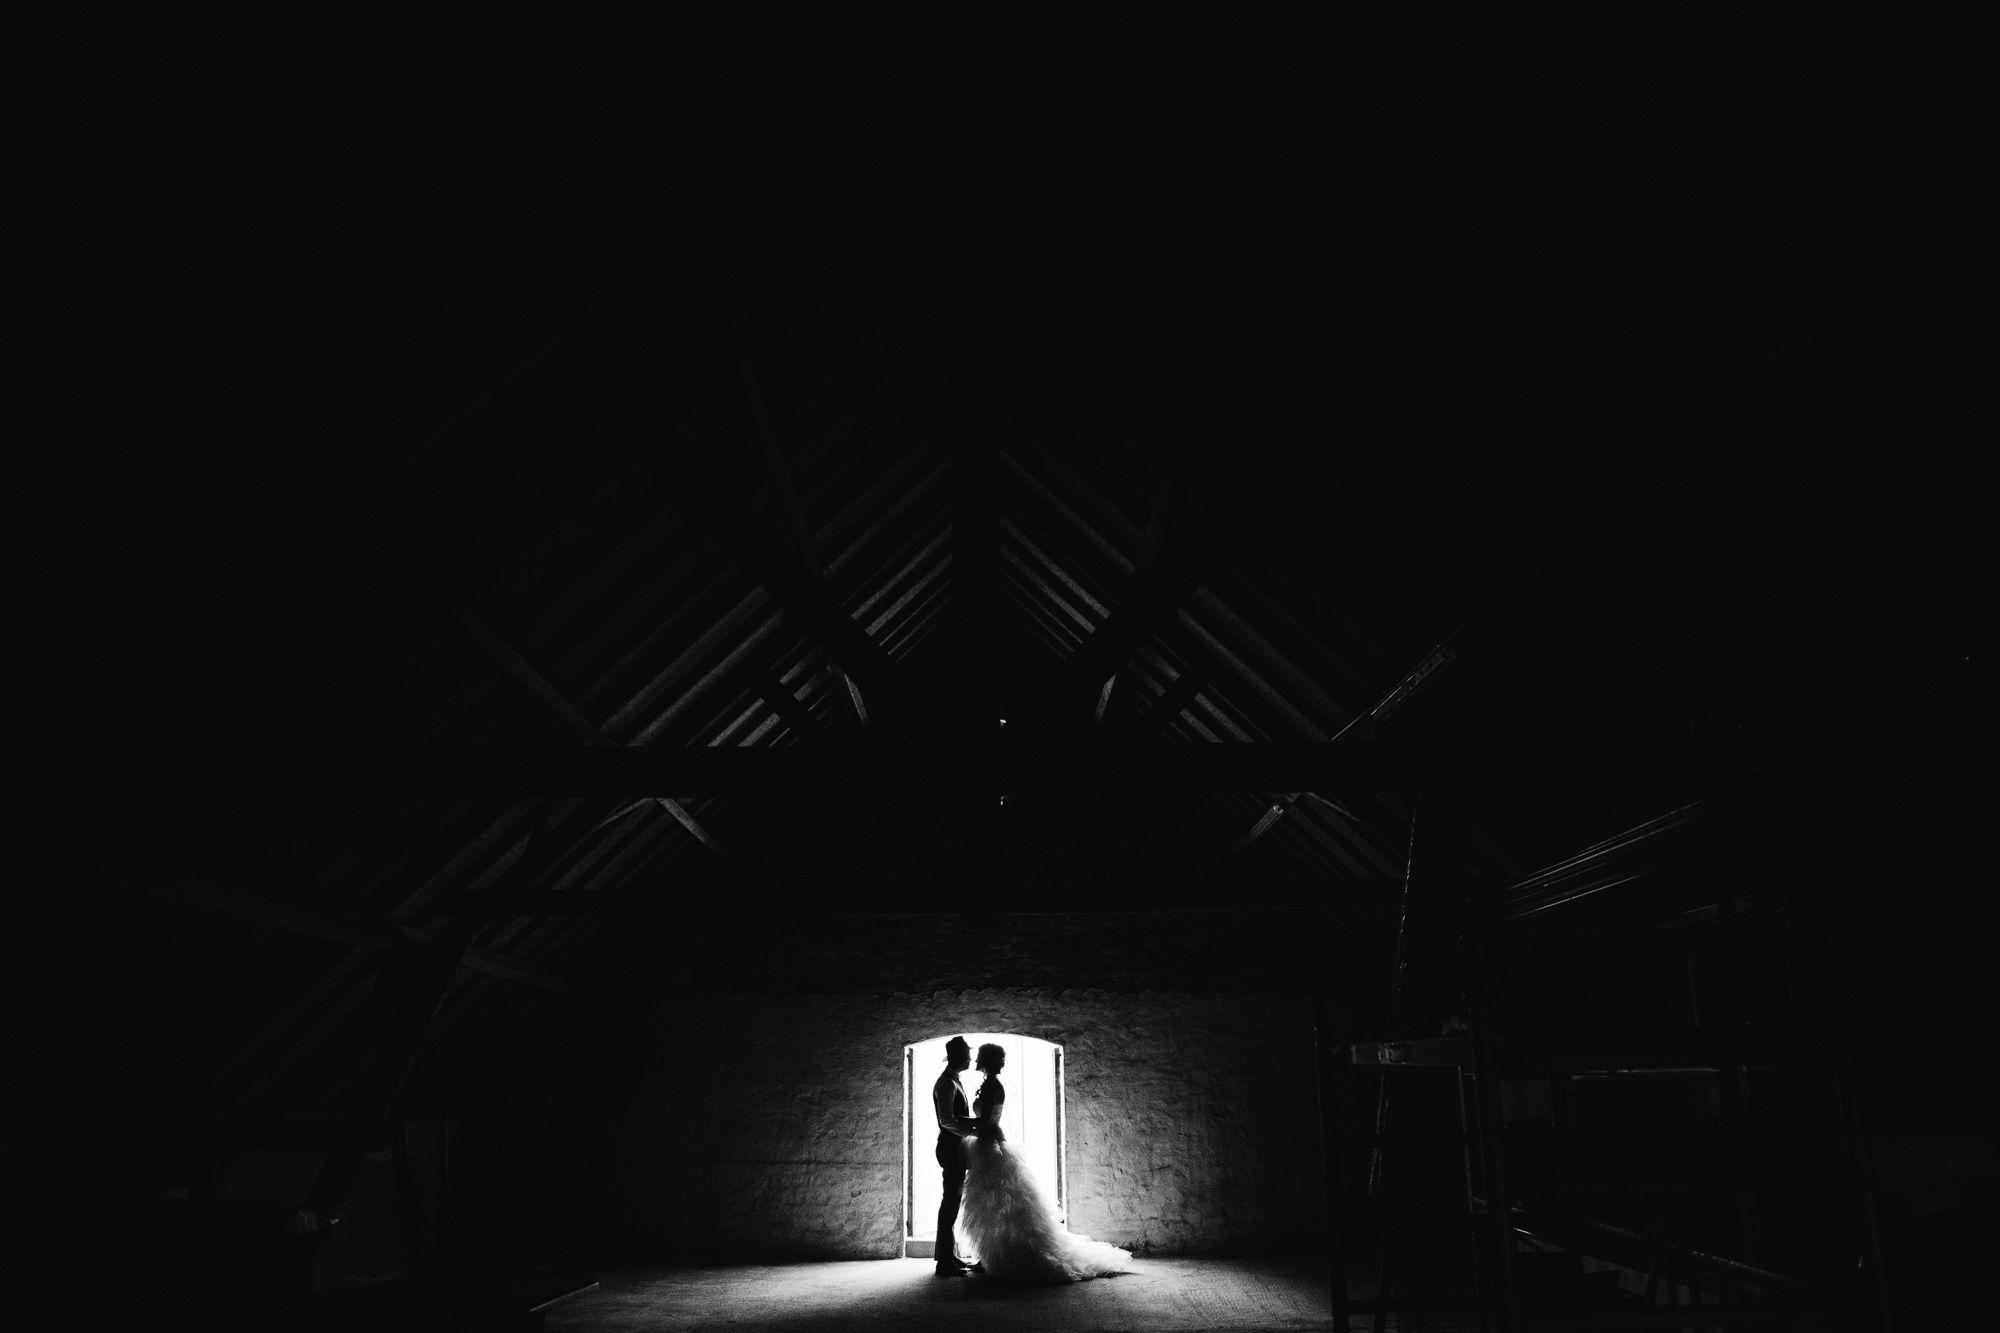 beste bruidsfoto's 2016